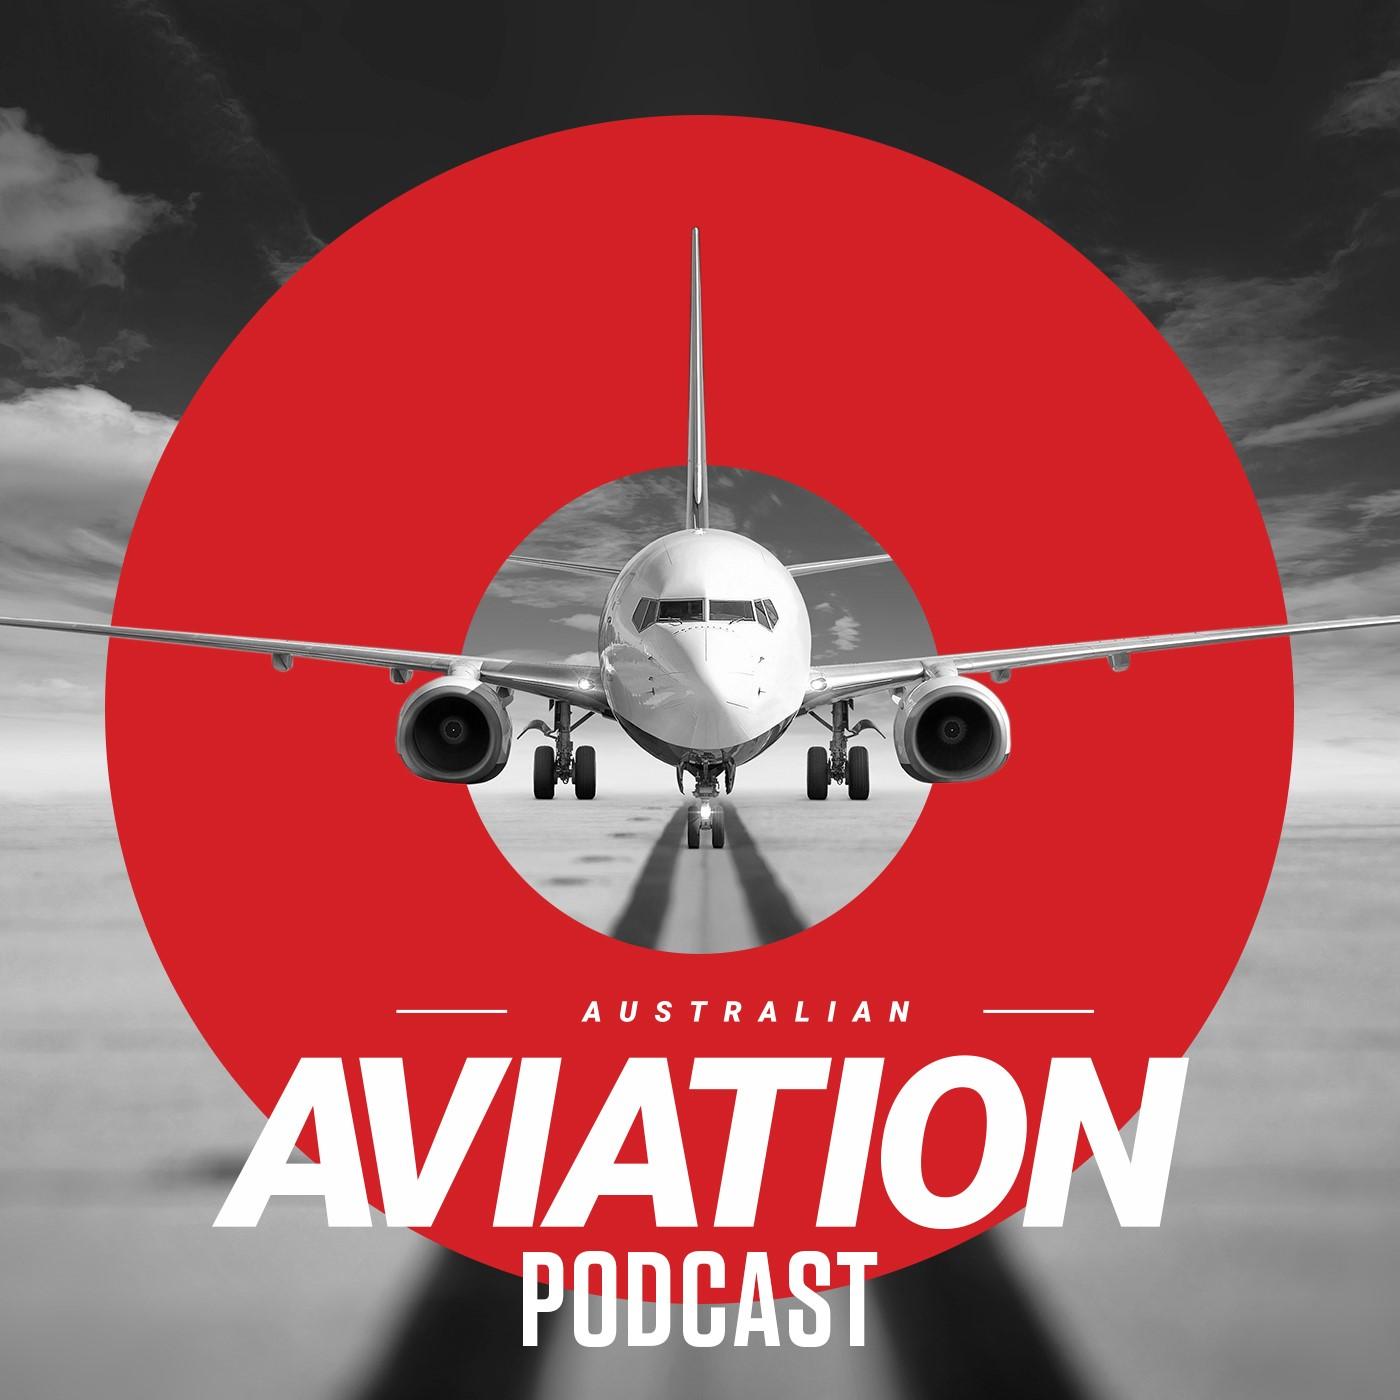 Australian Aviation Podcast show art